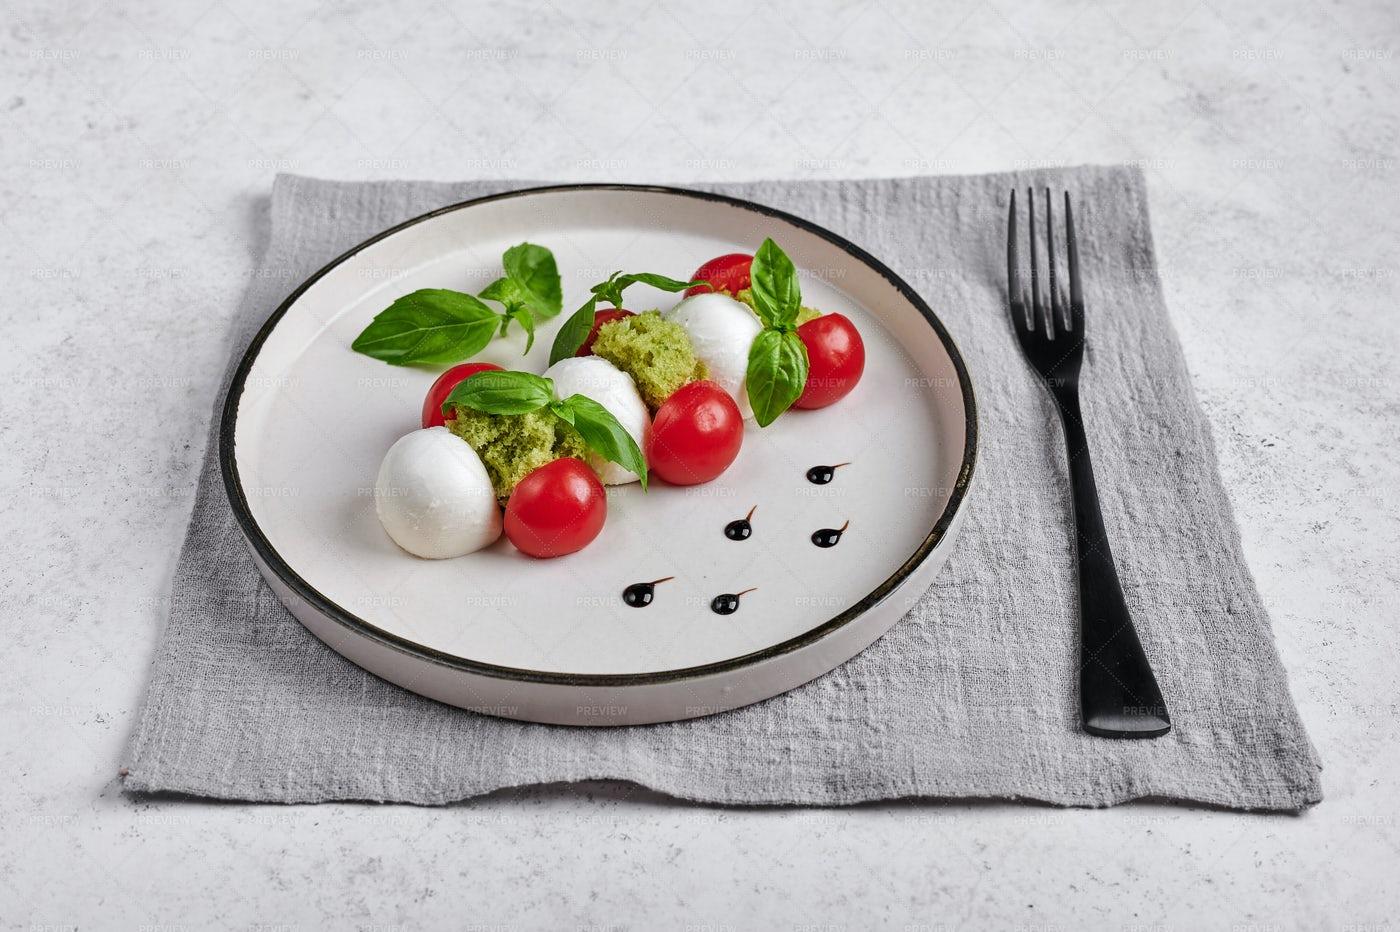 Caprese Salad And A Fork: Stock Photos